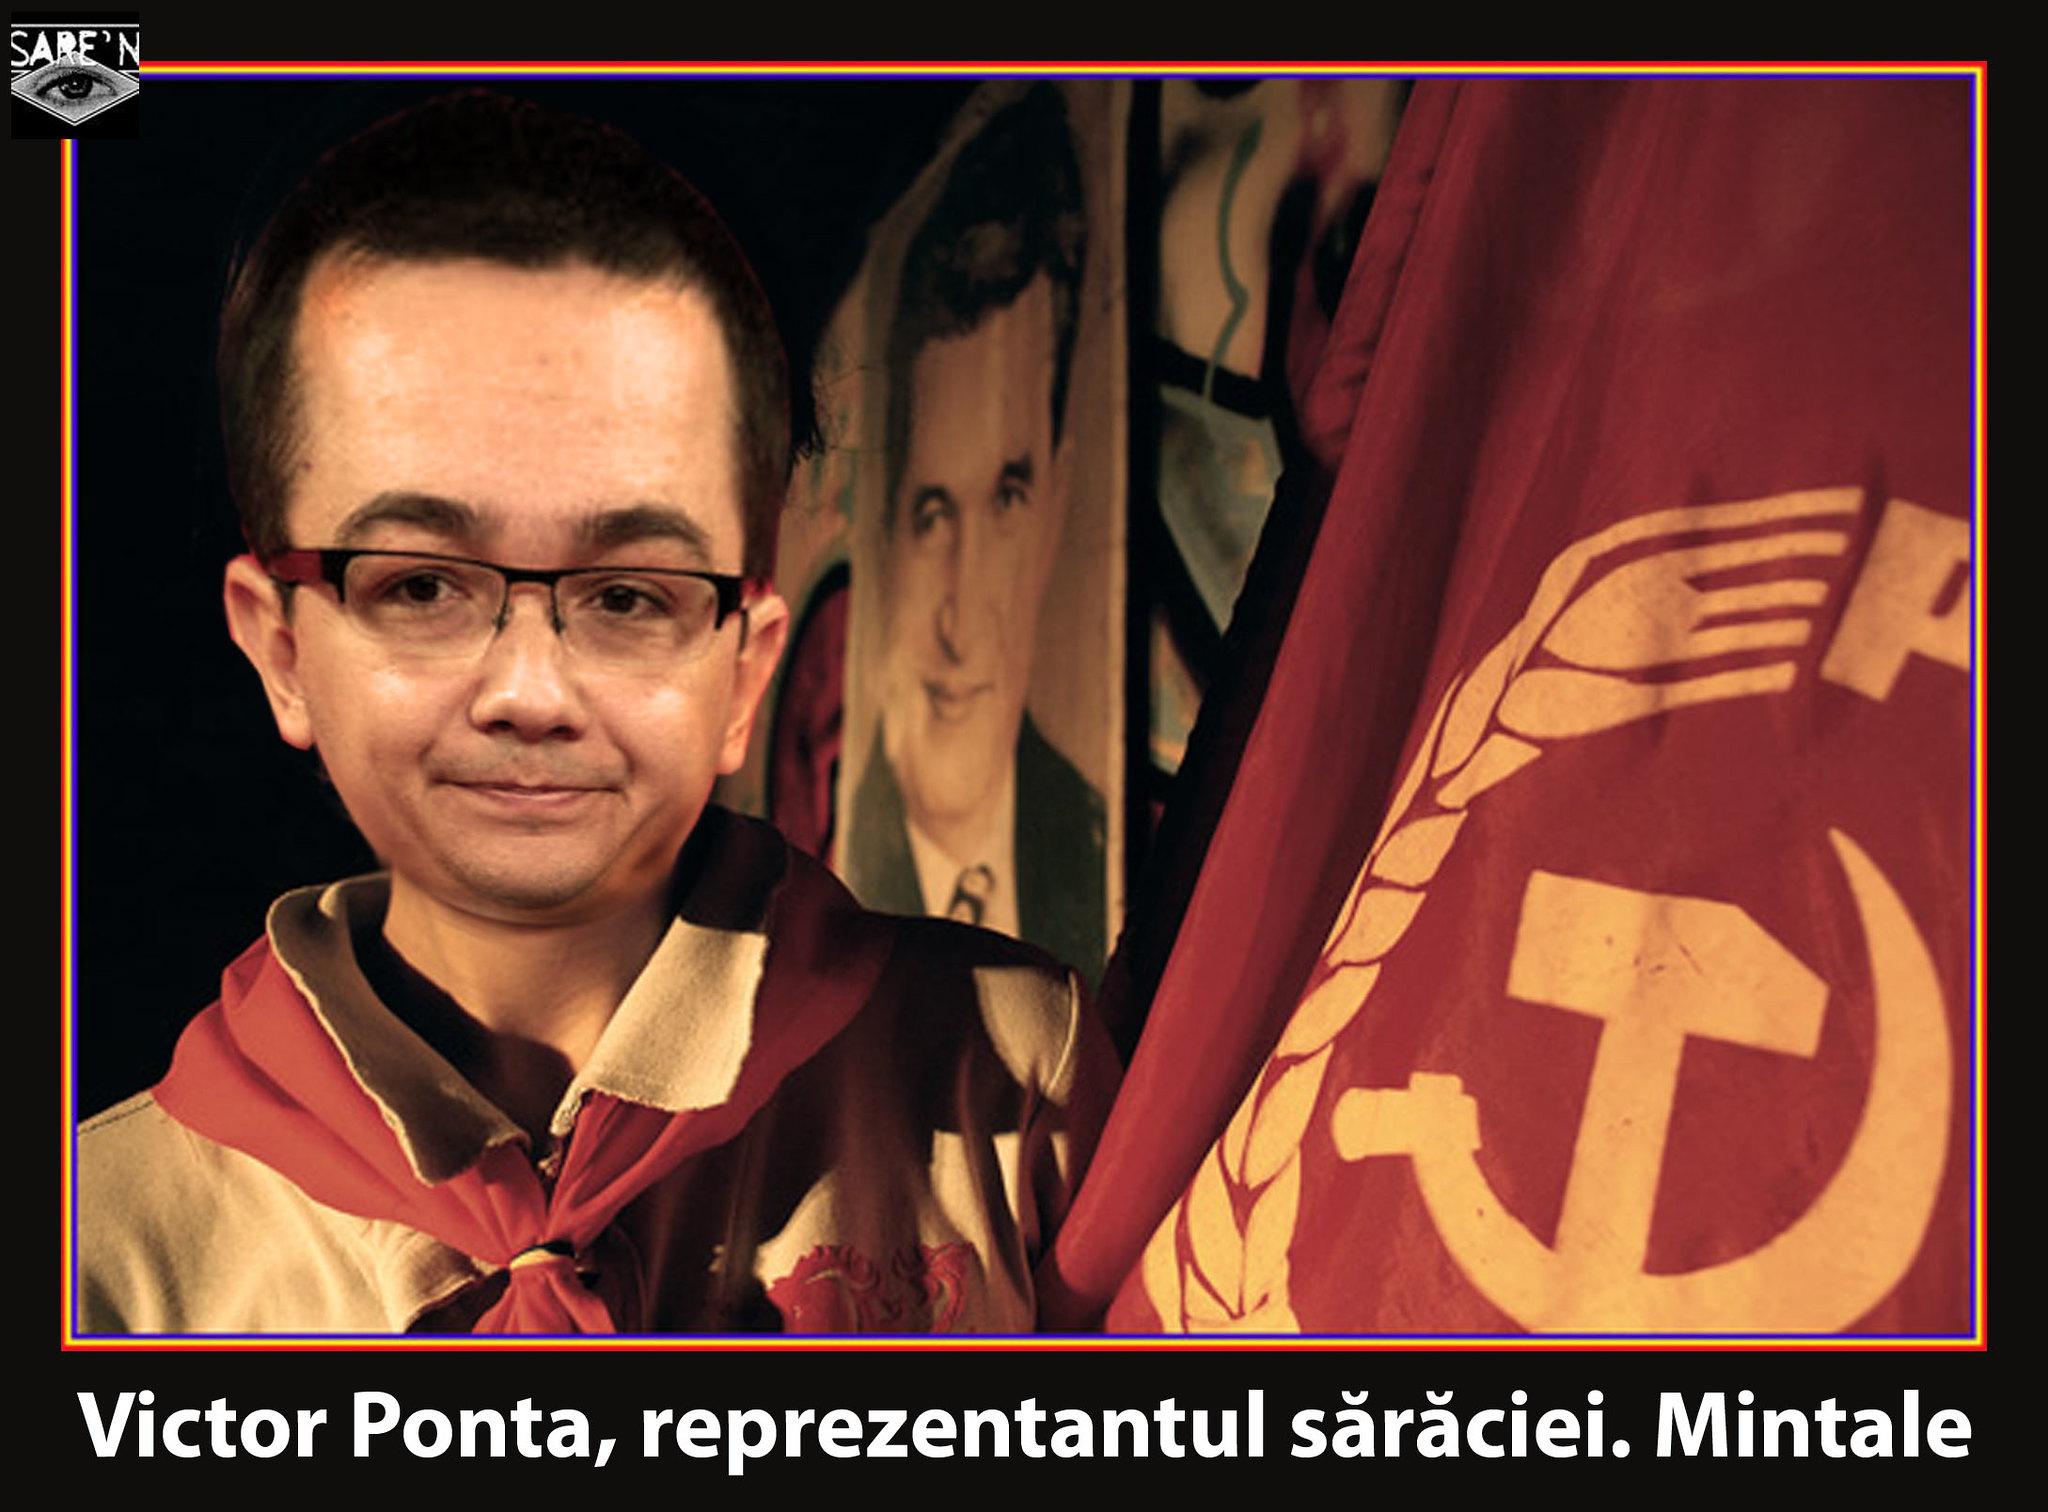 Viorel Ponta